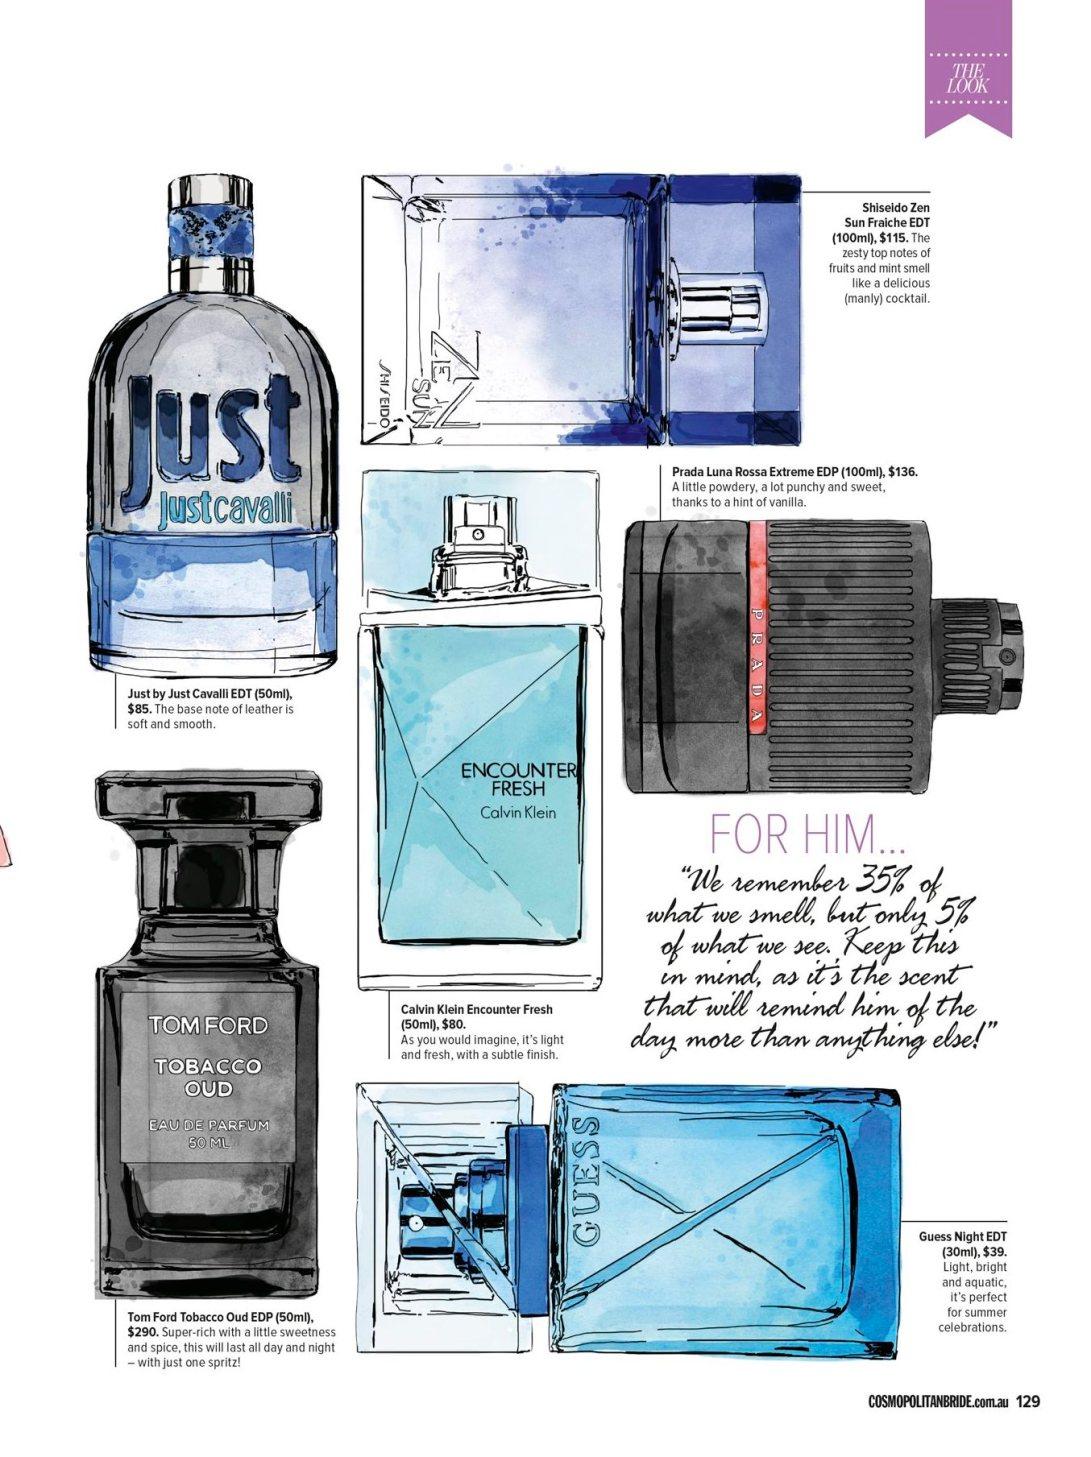 cs0314p129_perfume